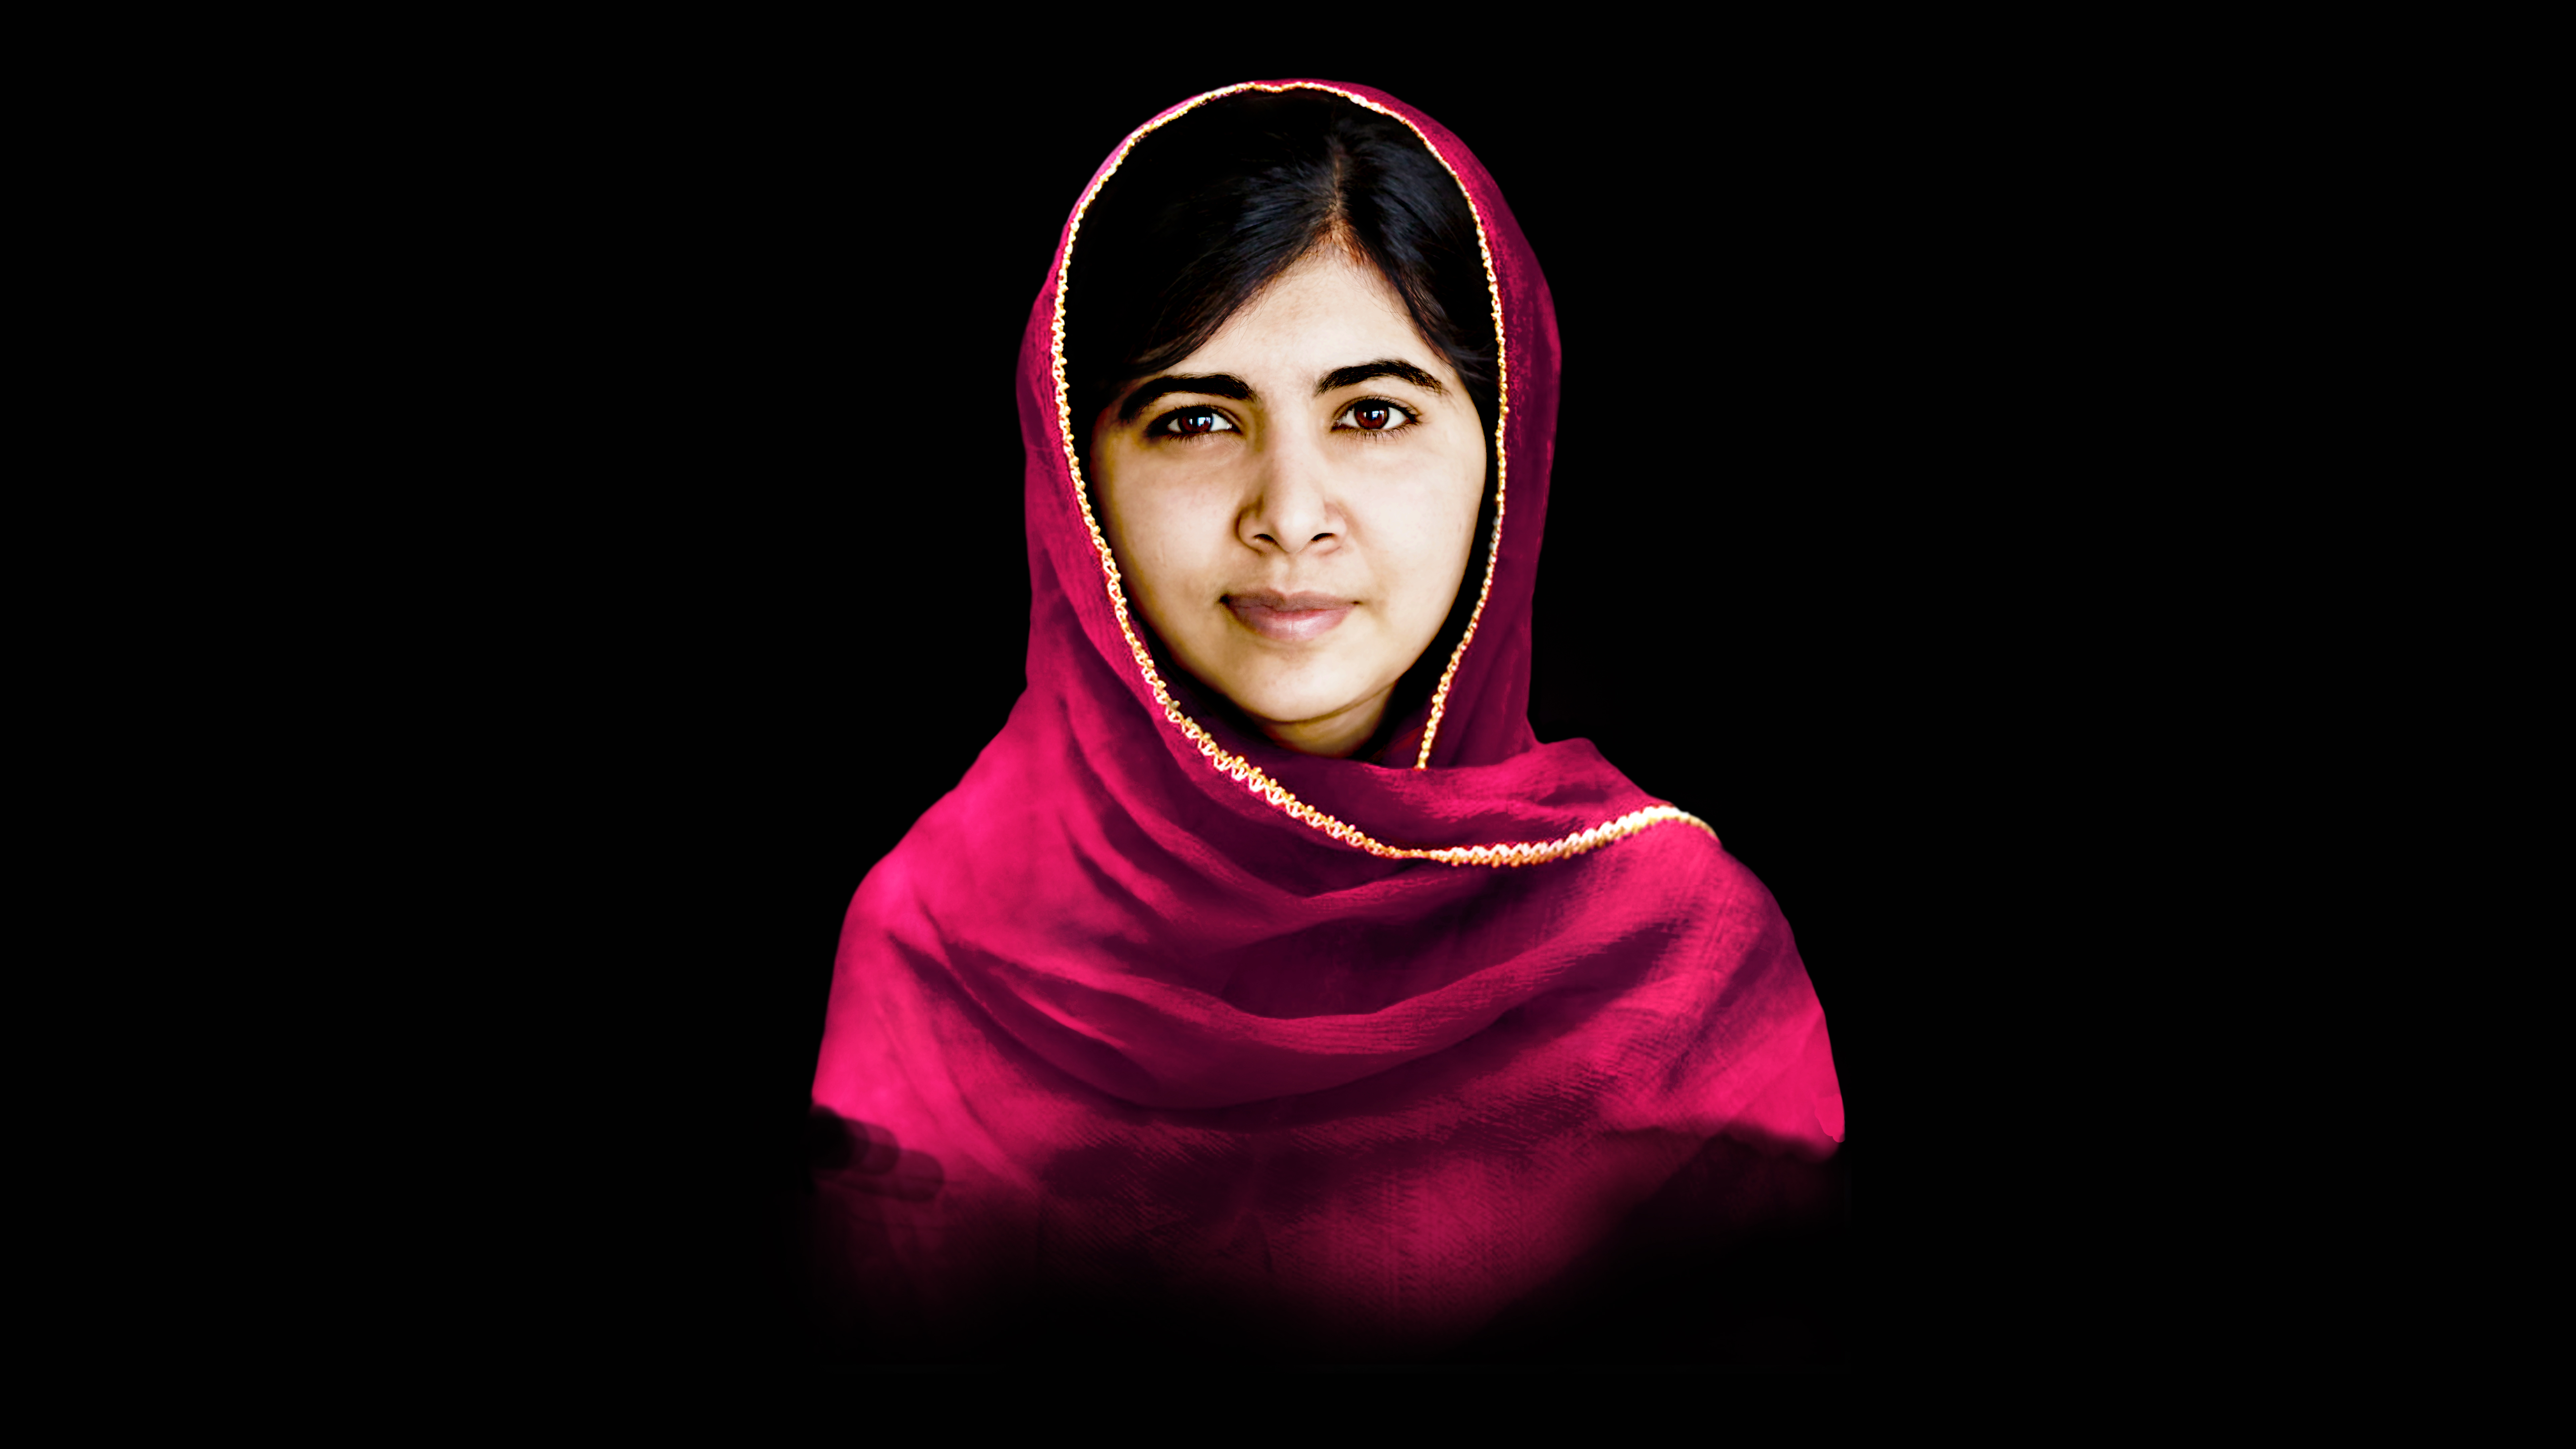 Malala Yousafzai 4K 8K Wallpapers HD Wallpapers 7680x4320